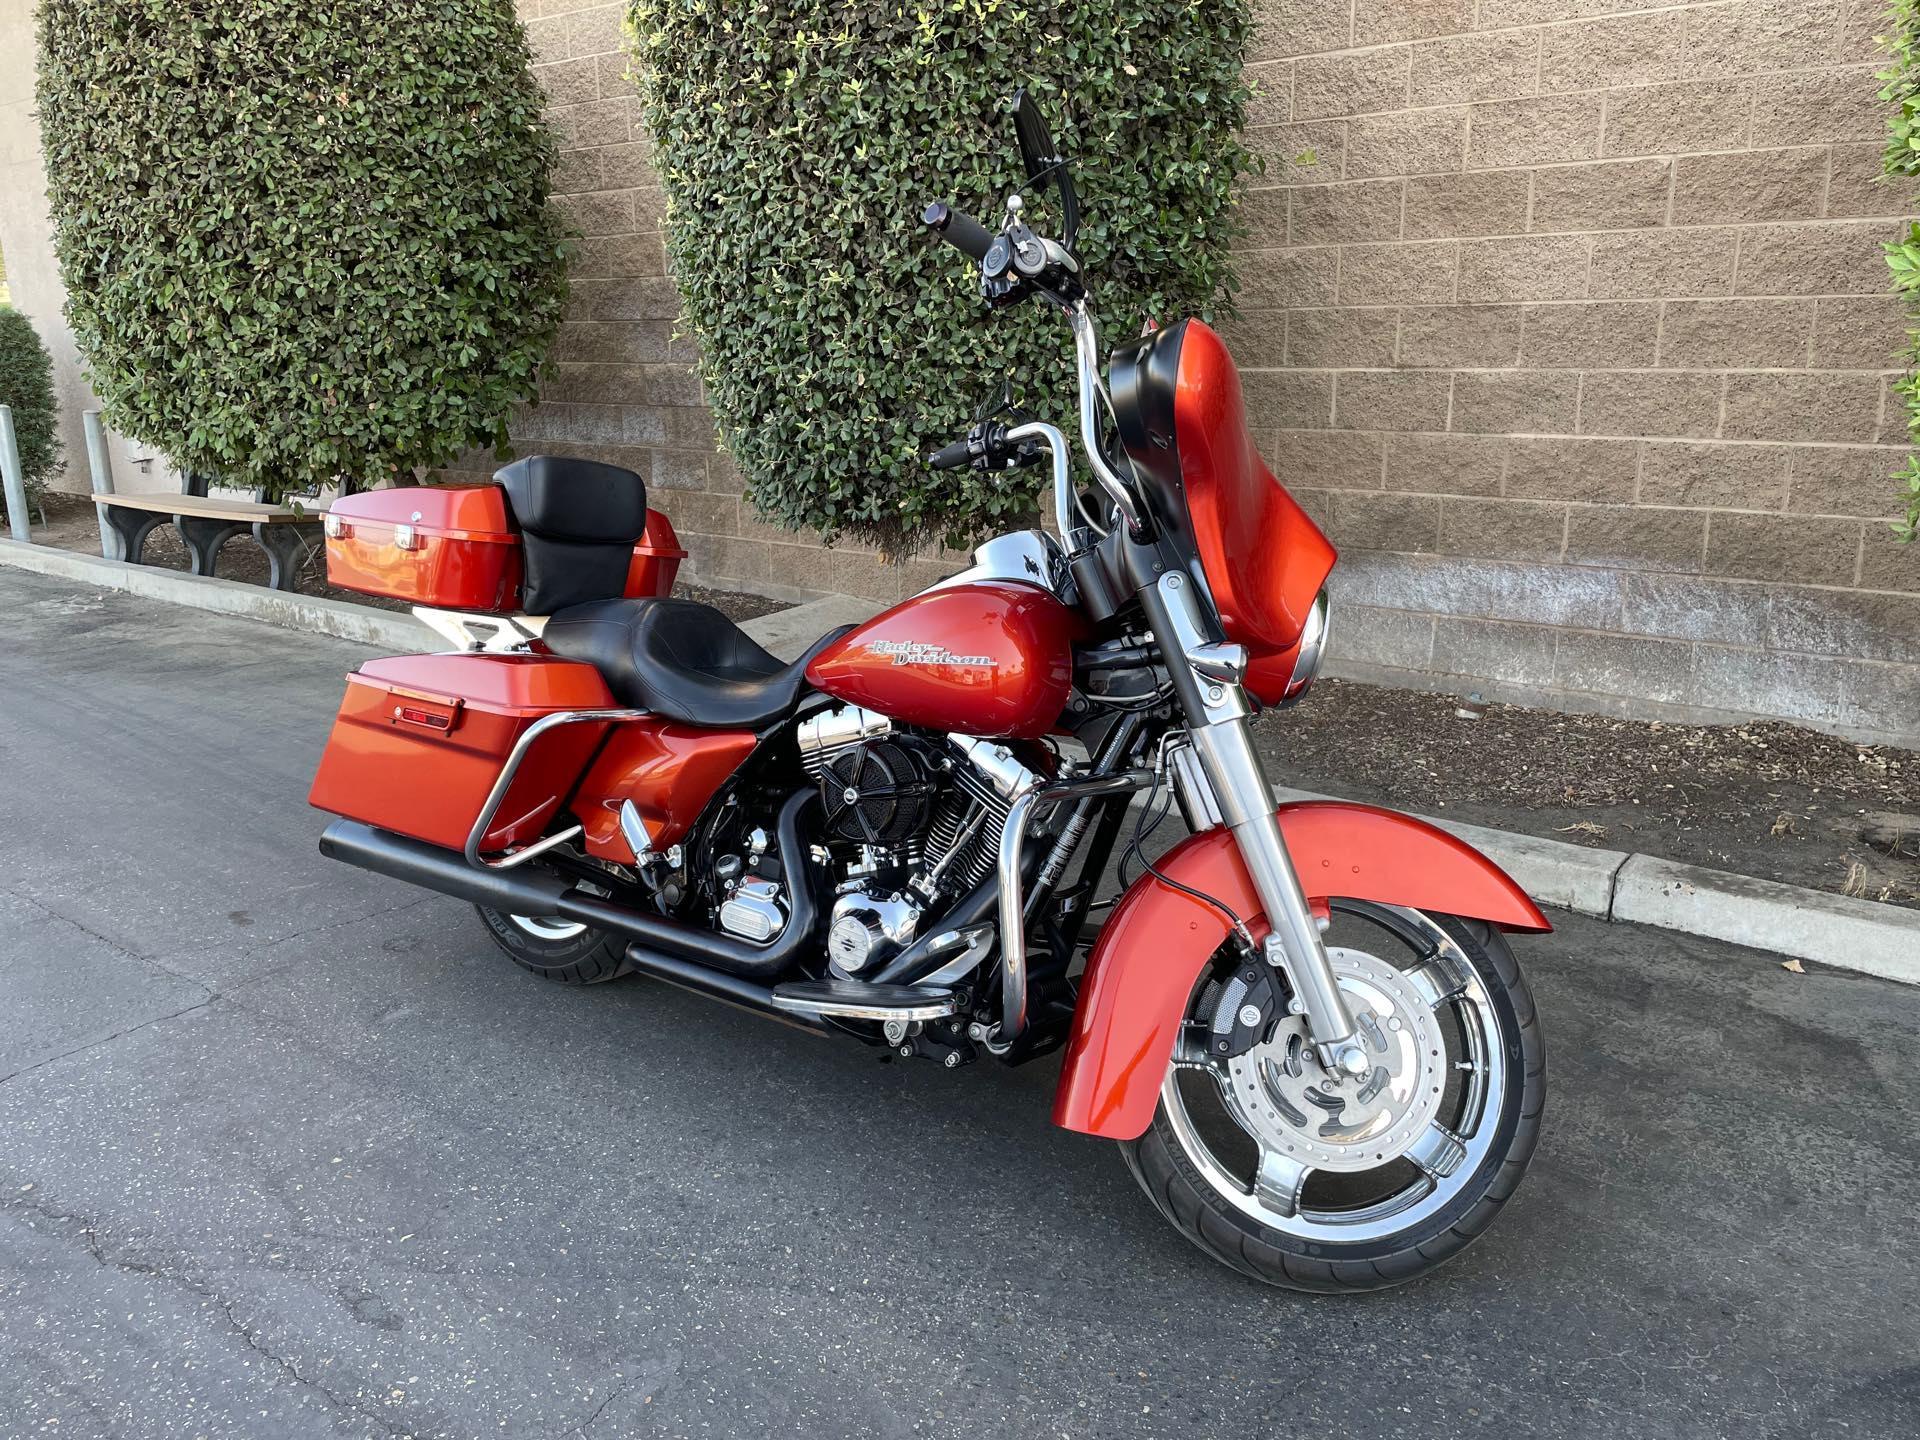 2011 Harley-Davidson Street Glide Base at Fresno Harley-Davidson